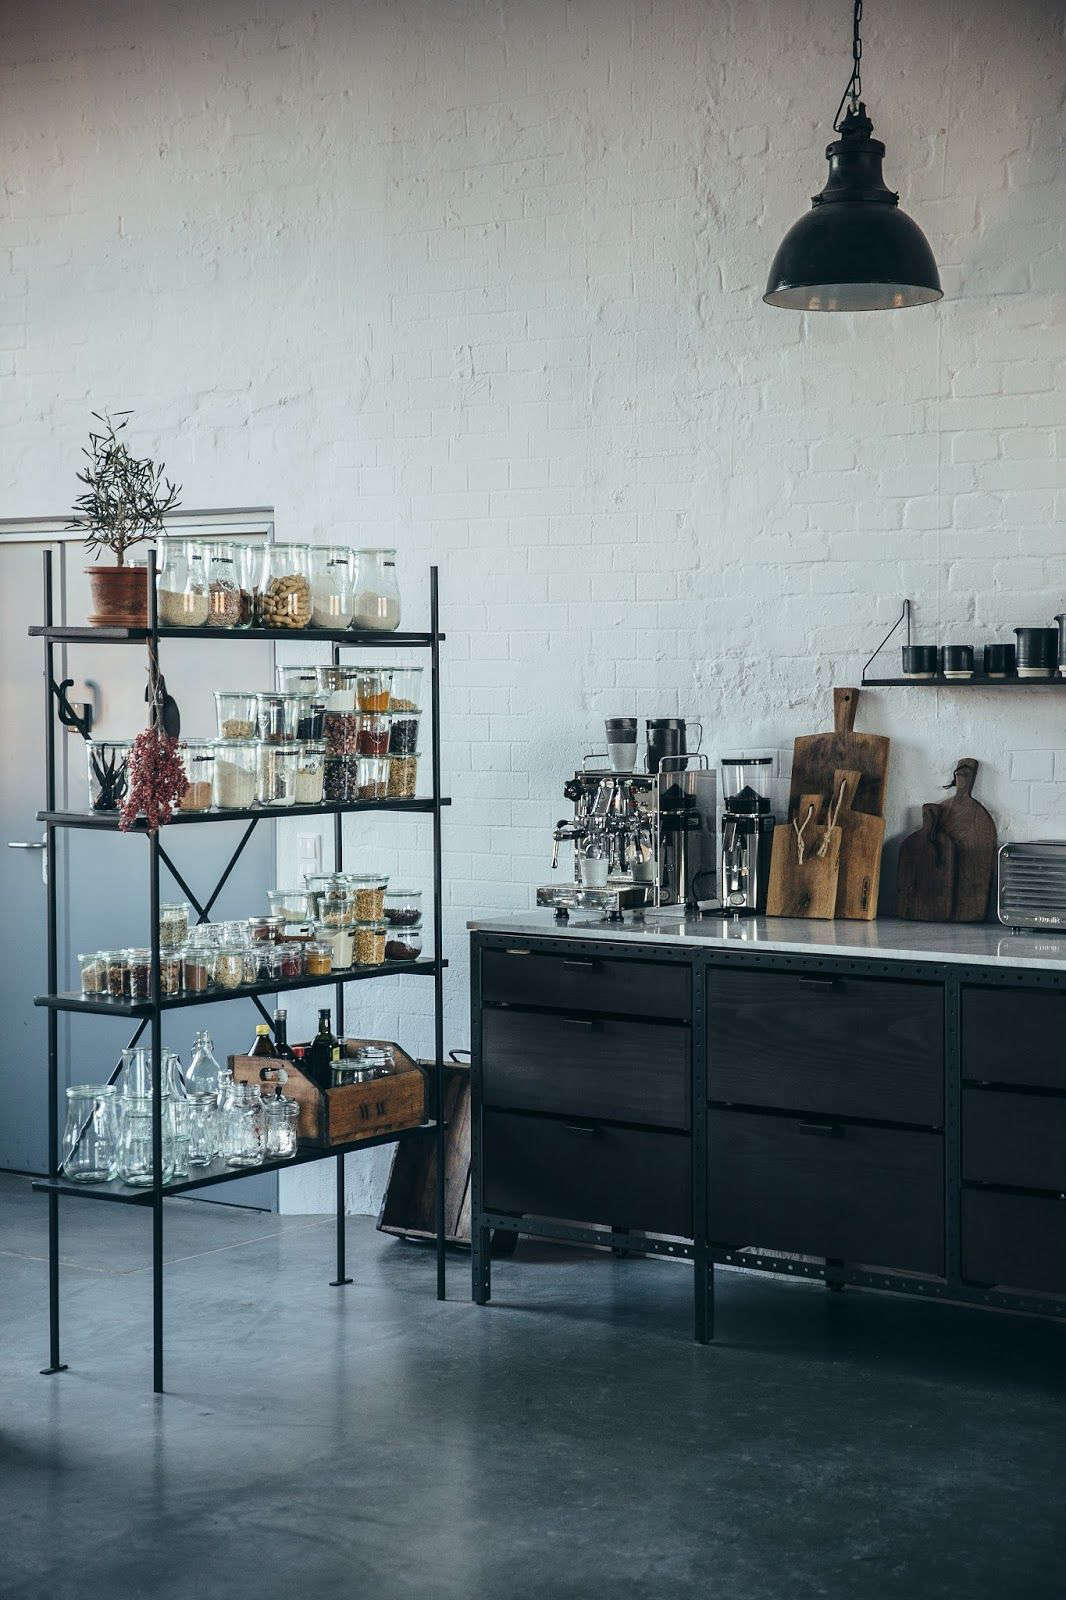 Frama Studio Kitchen Douglas Fir Cabinets Berlin Our Food Stories Studio